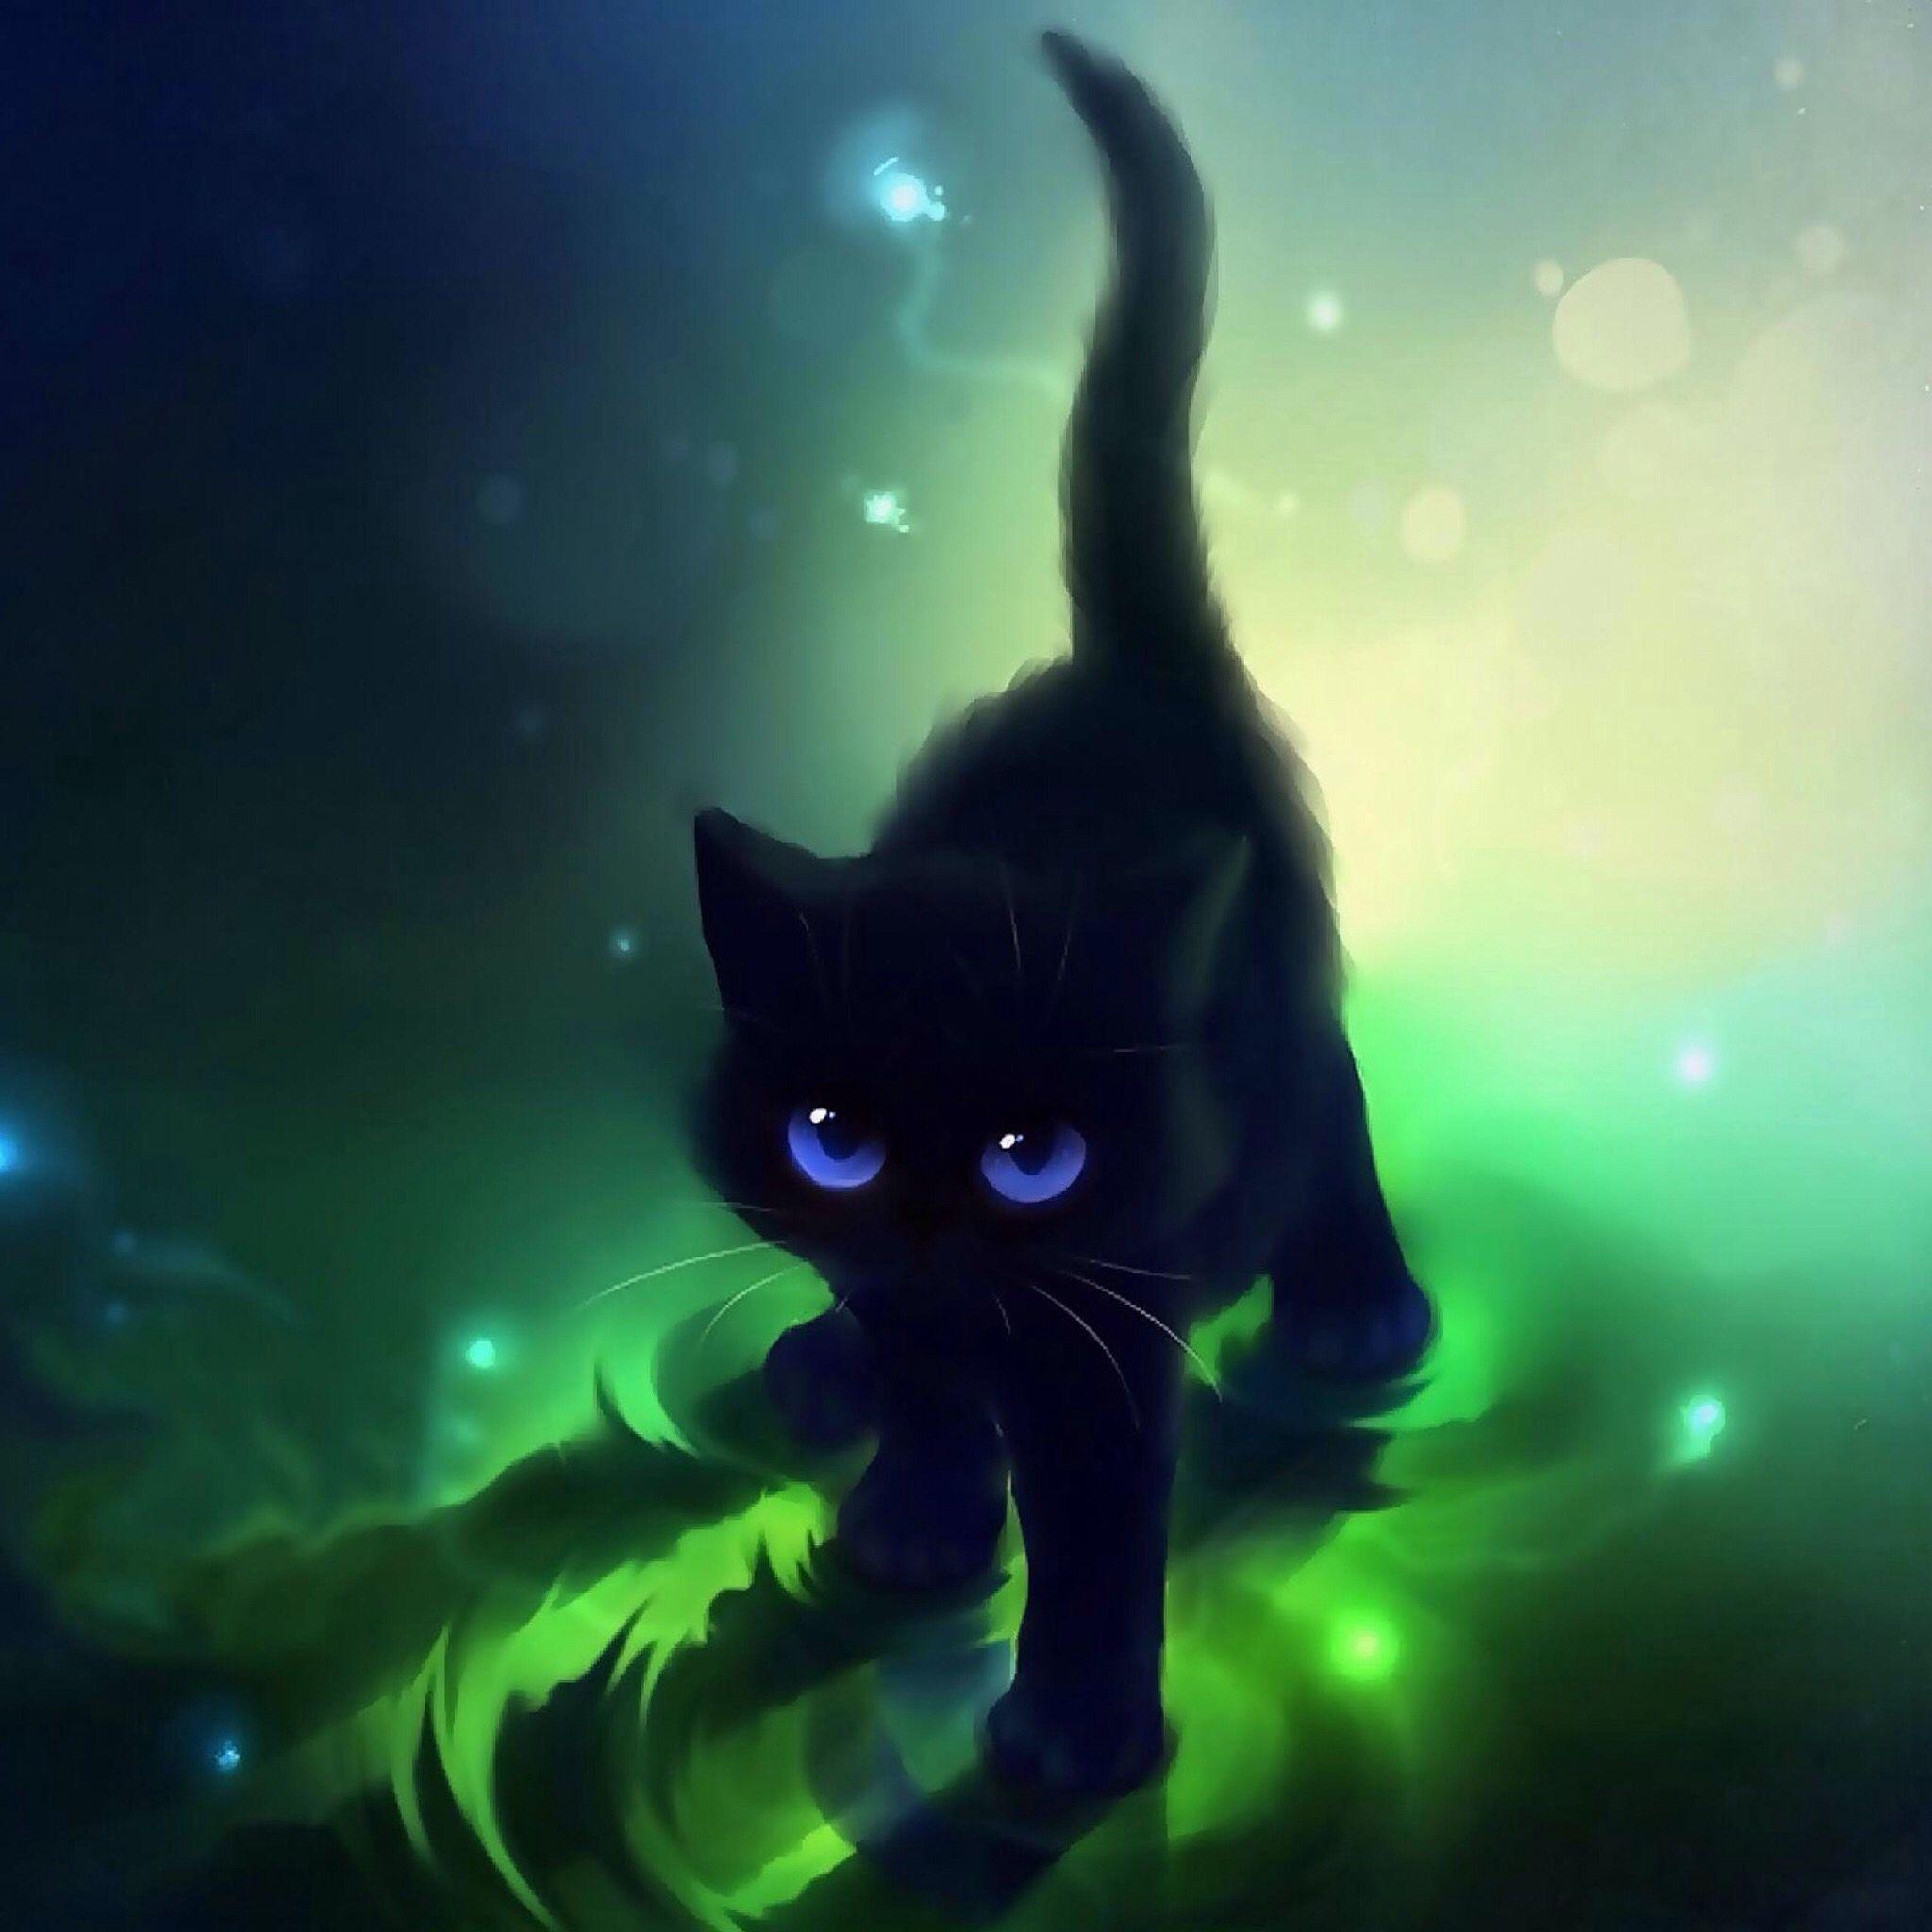 Dark Wallpaper Anime Cat Best Wallpaper Hd Cat Artwork Cat Art Cat Wallpaper